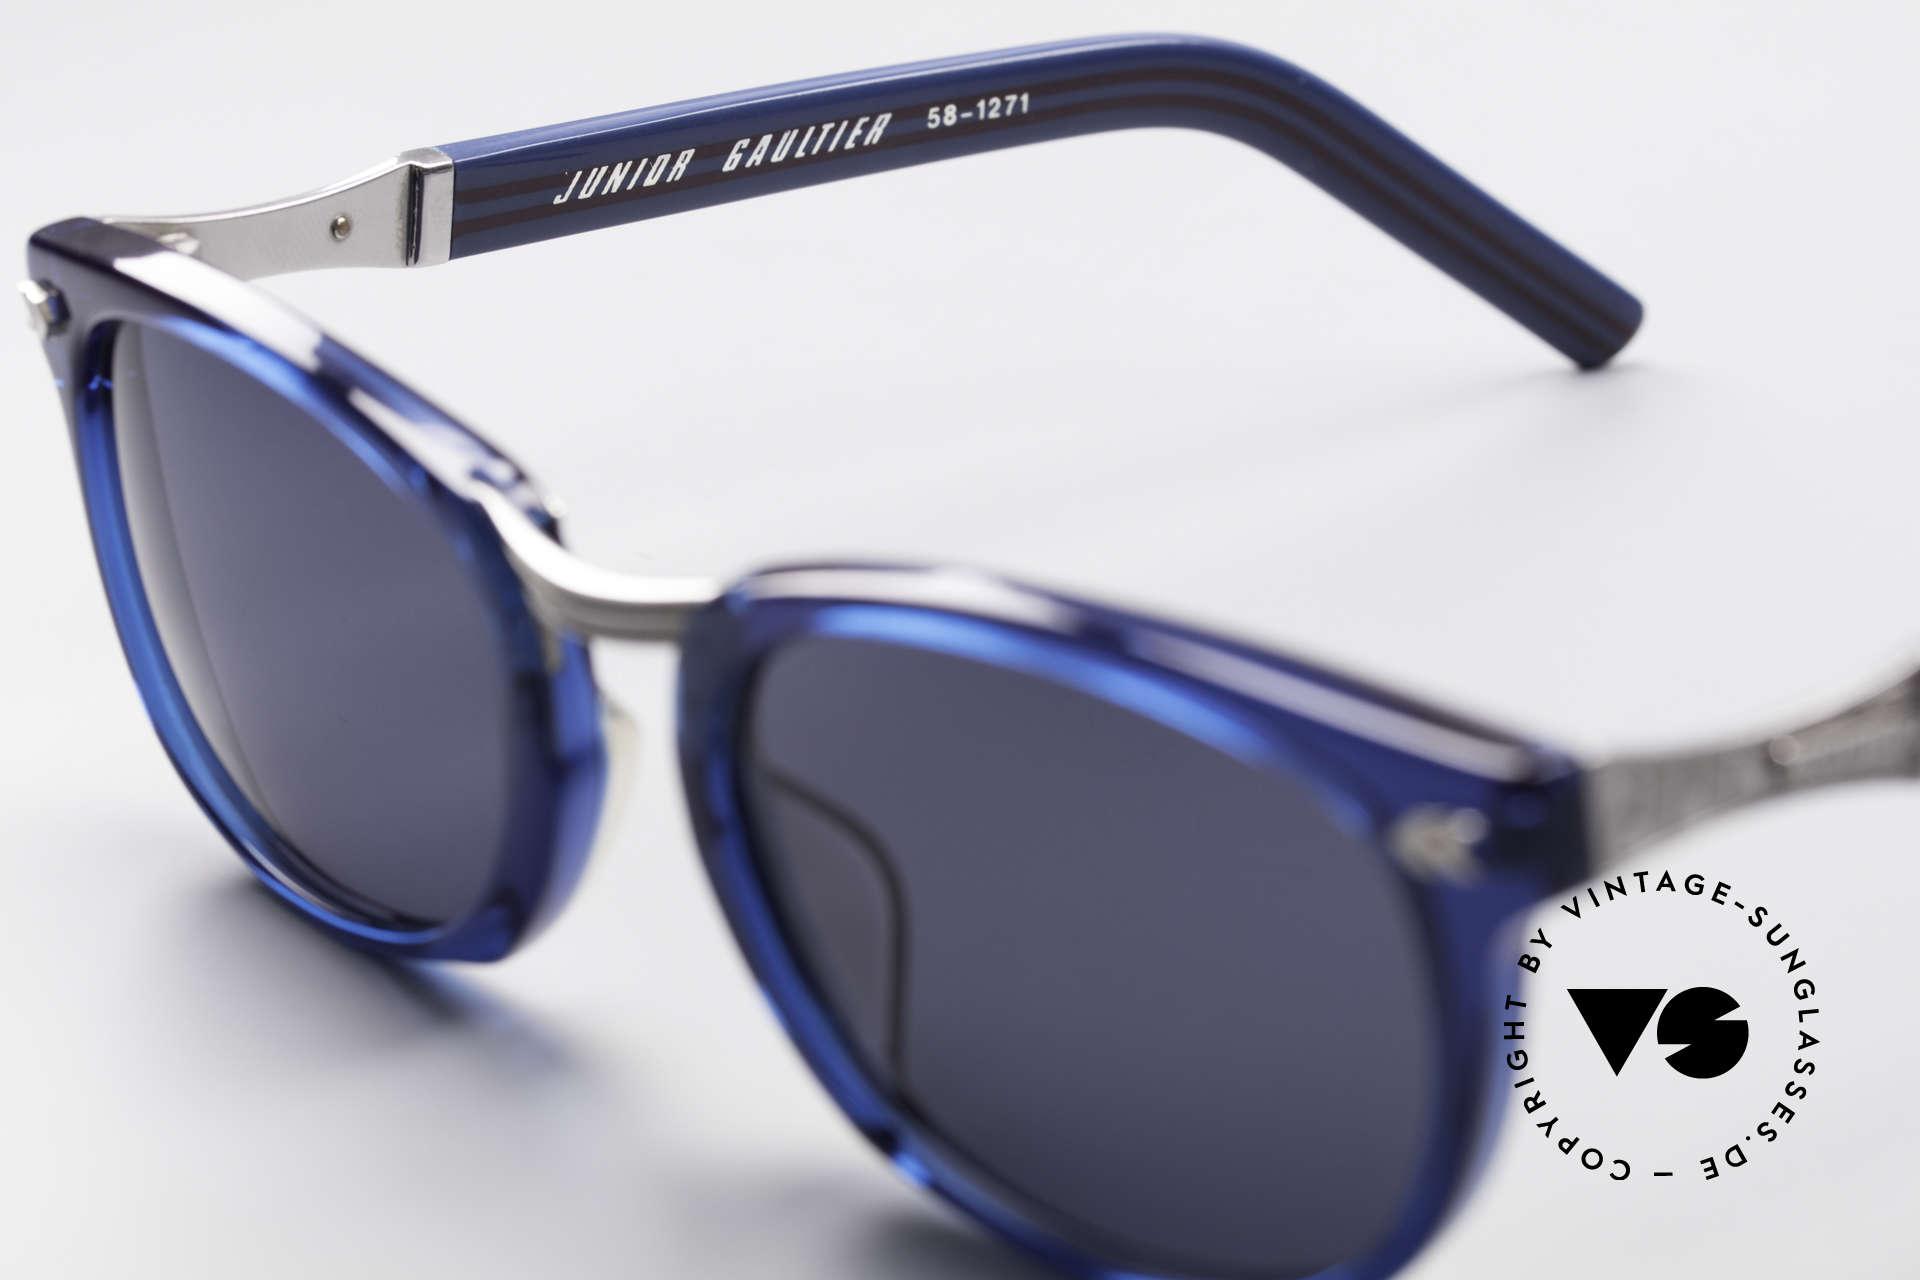 Jean Paul Gaultier 58-1271 Junior Gaultier Sunglasses, unworn, NOS (like all our old JPG designer sunglasses), Made for Men and Women